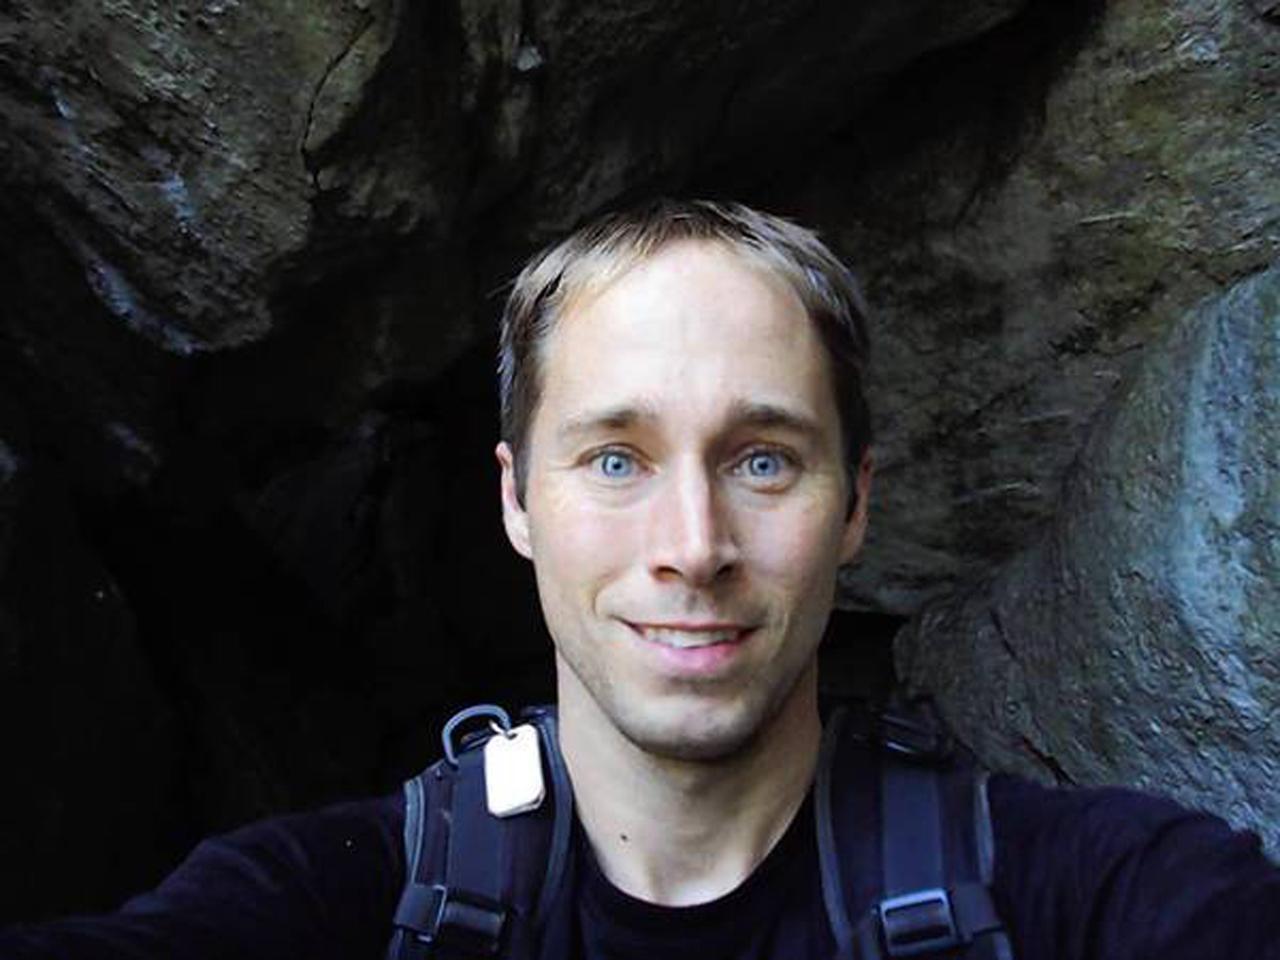 Disappearance of popular Pa  teacher Matthew Greene in Calif